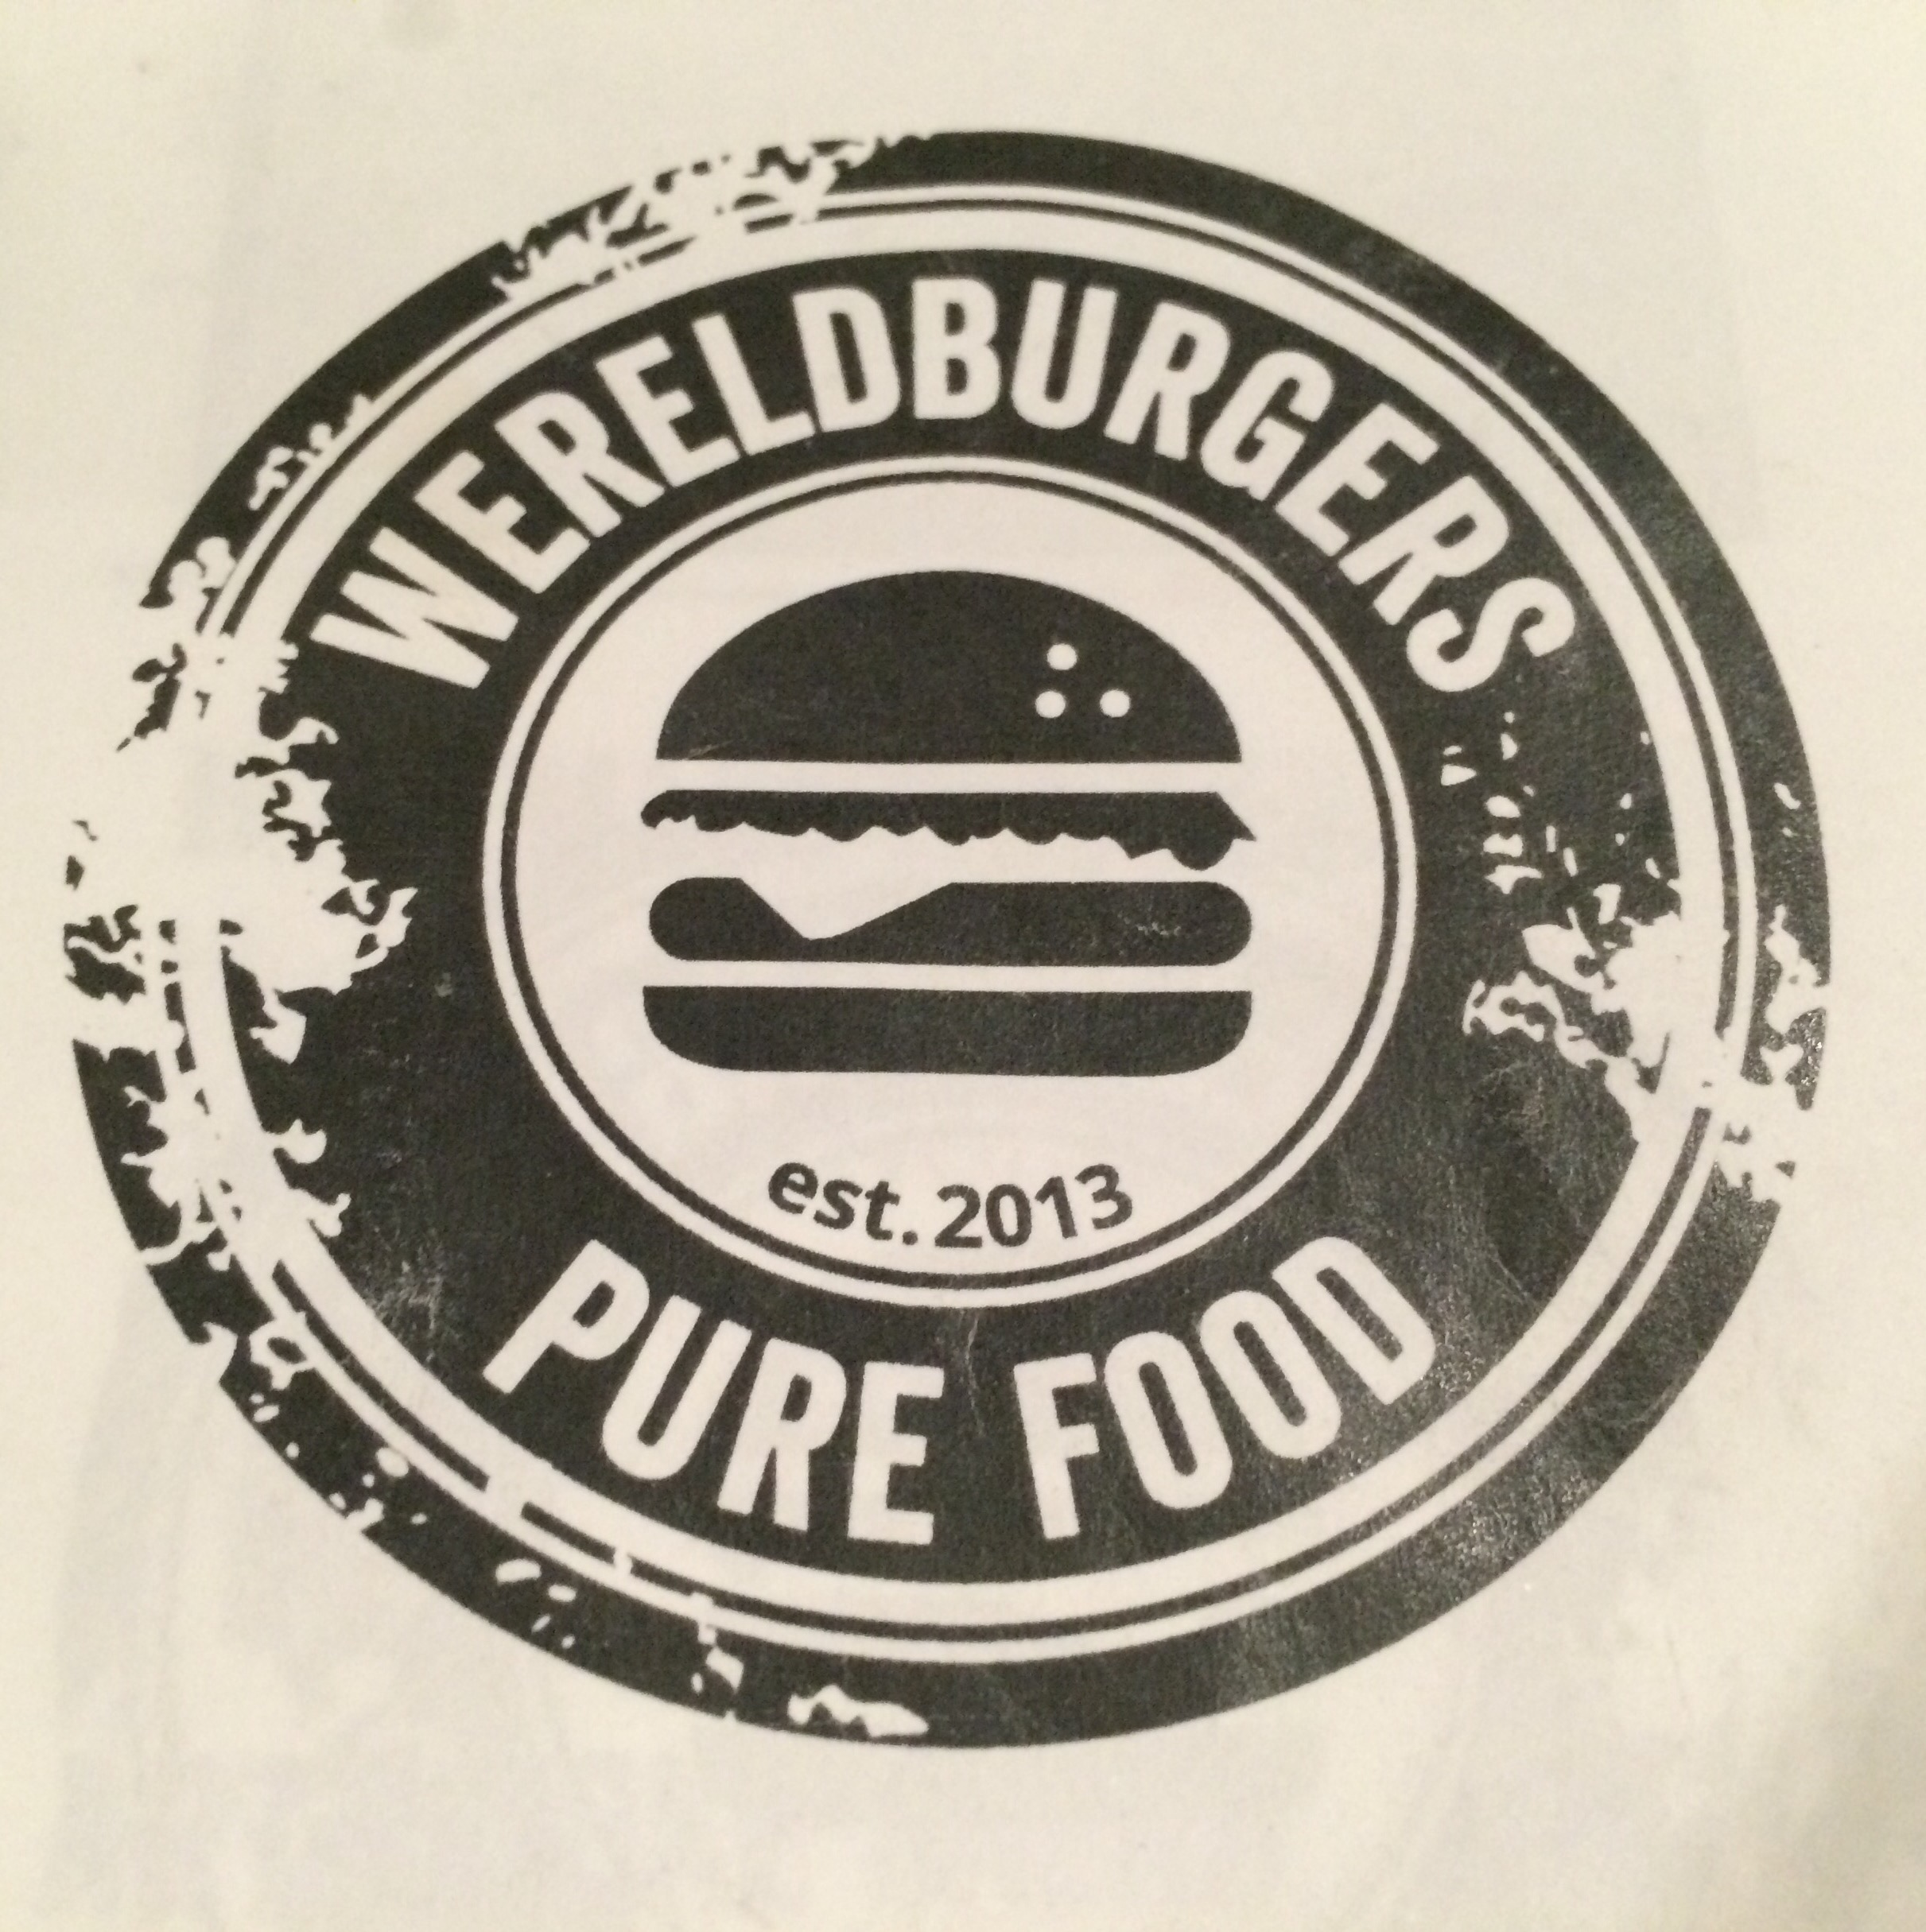 Wereldburgers, Groningen